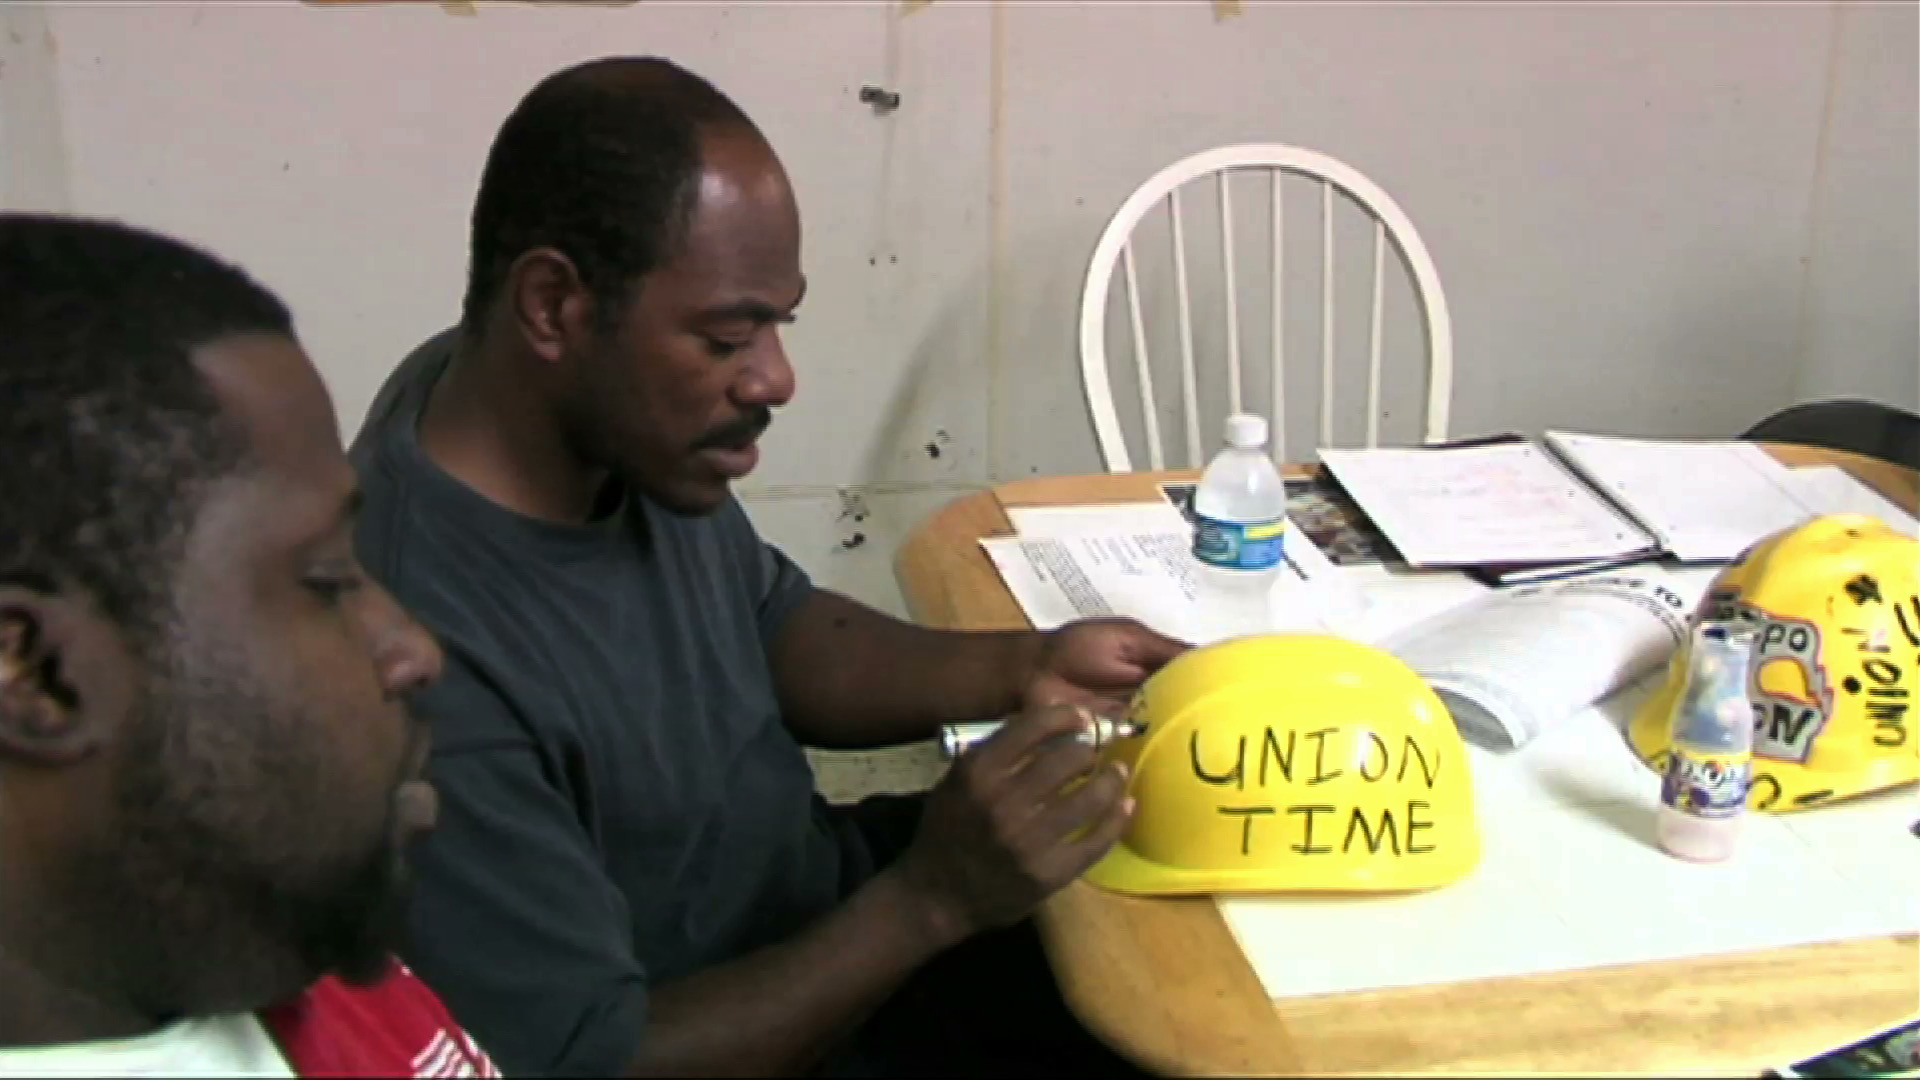 Время профсоюза: Борьба за права рабочих (Union Time: Fighting for Workers' Rights), 2018 (английские субтитры)